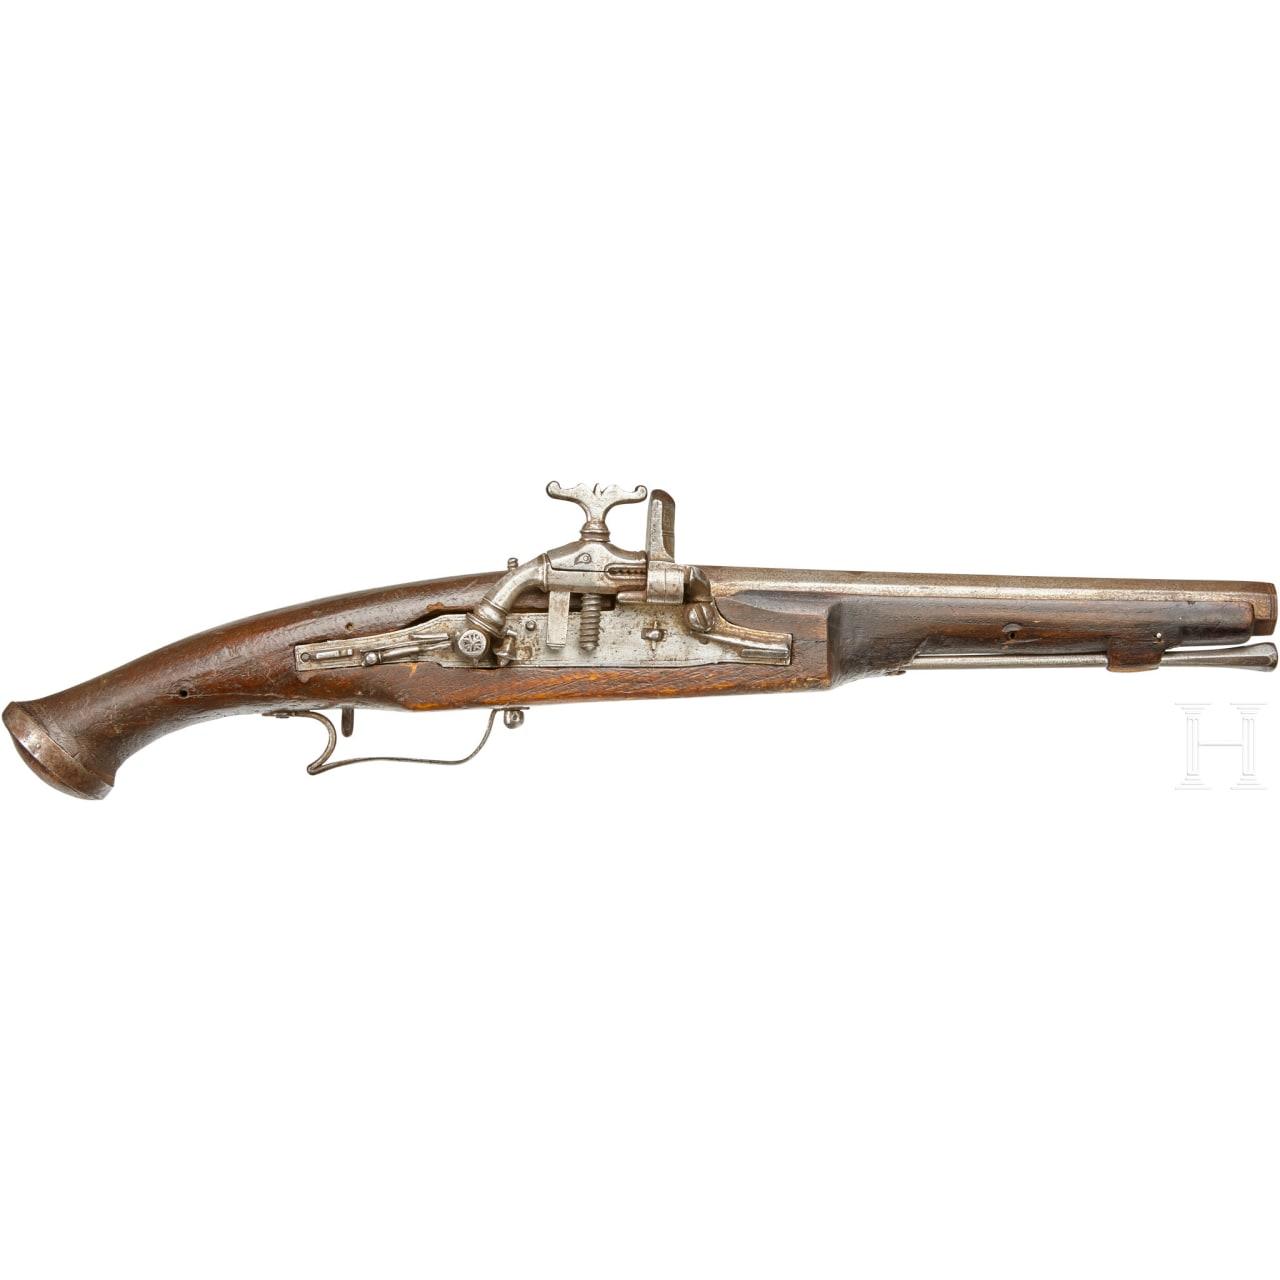 Schnapphahnschlosspistole, Portugal, 2. Hälfte 17. Jhdt.